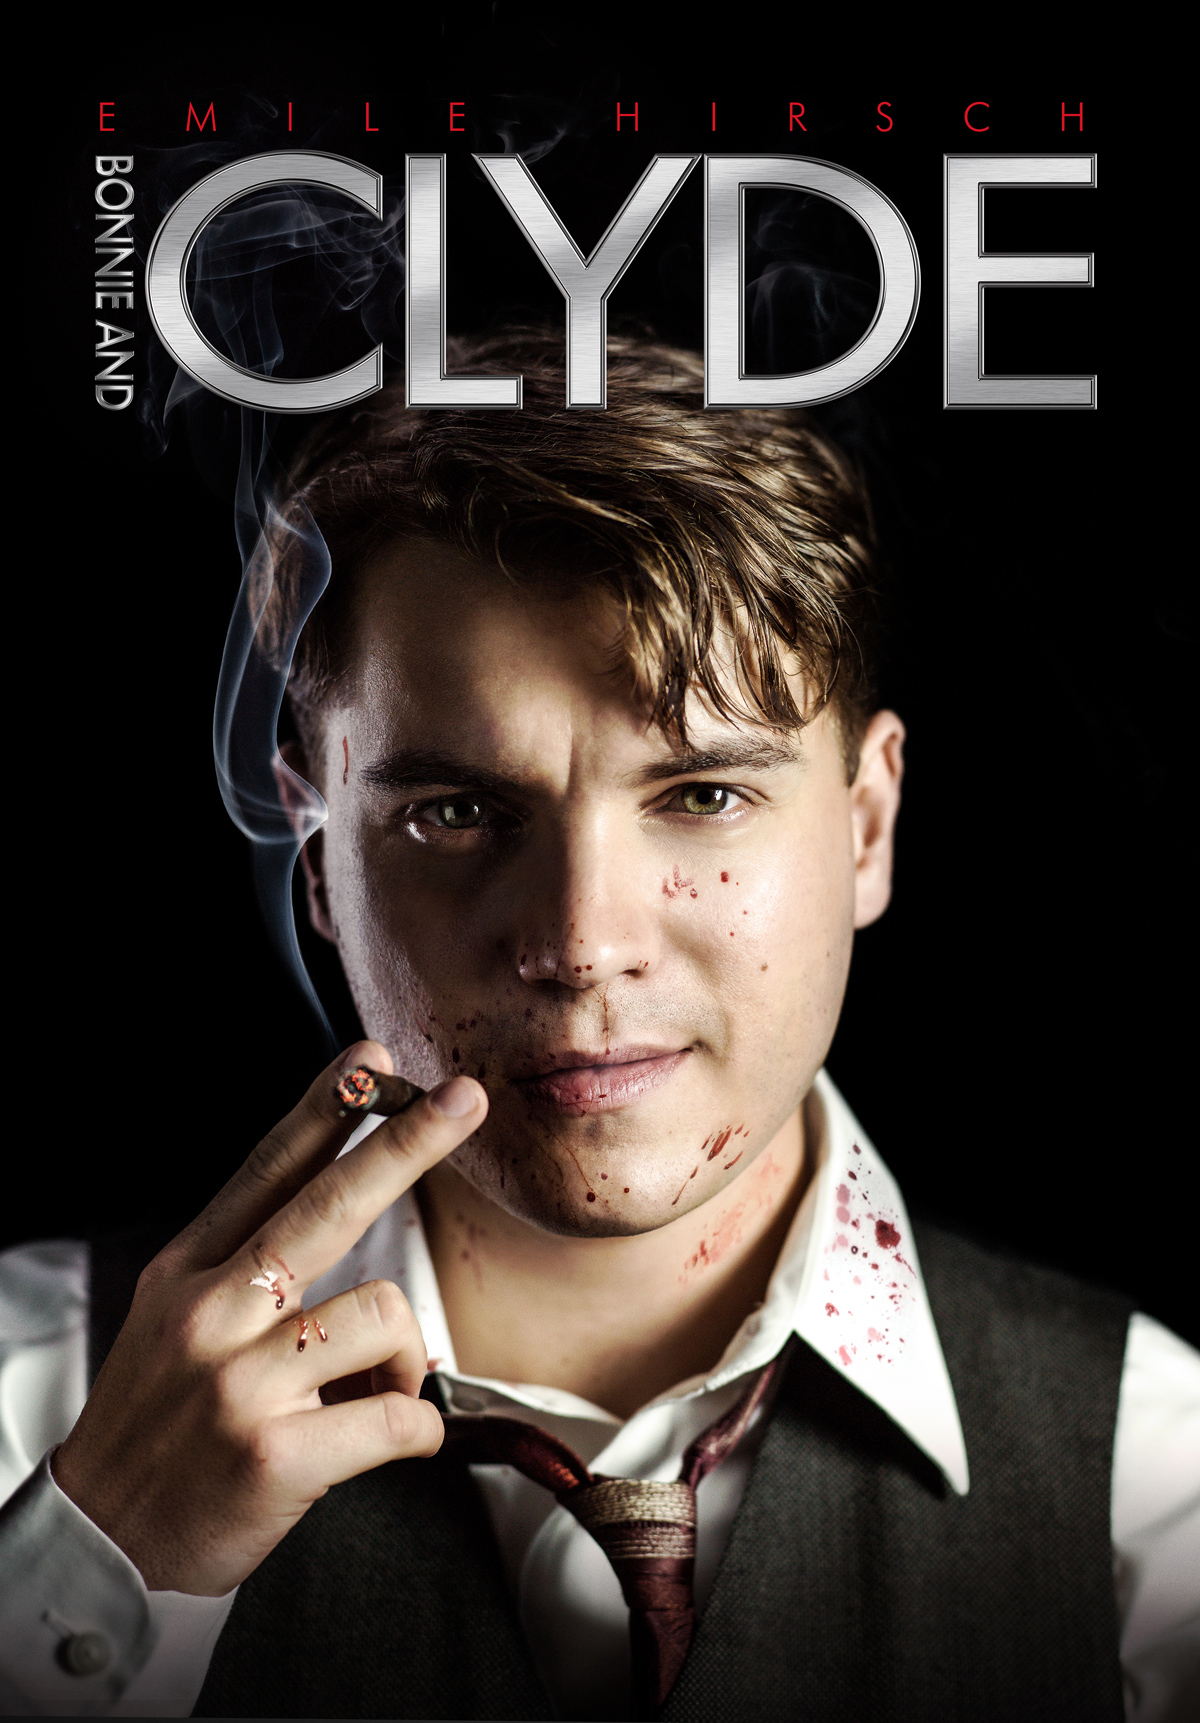 TV_History_Clyde.jpg